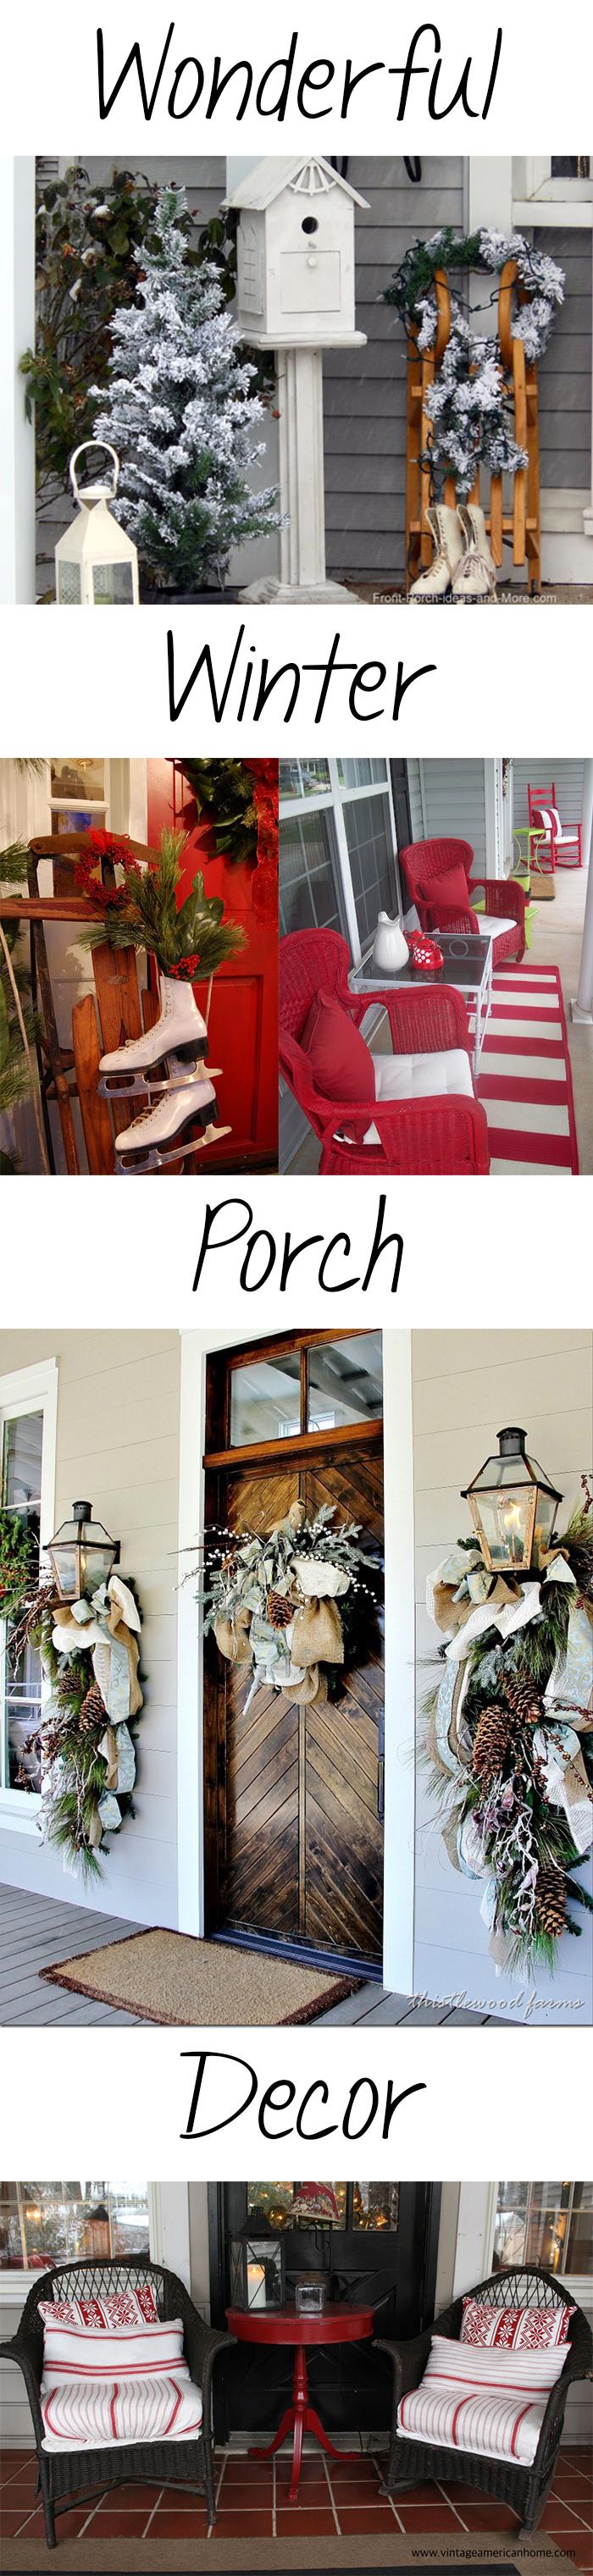 wonderful winter porch decor